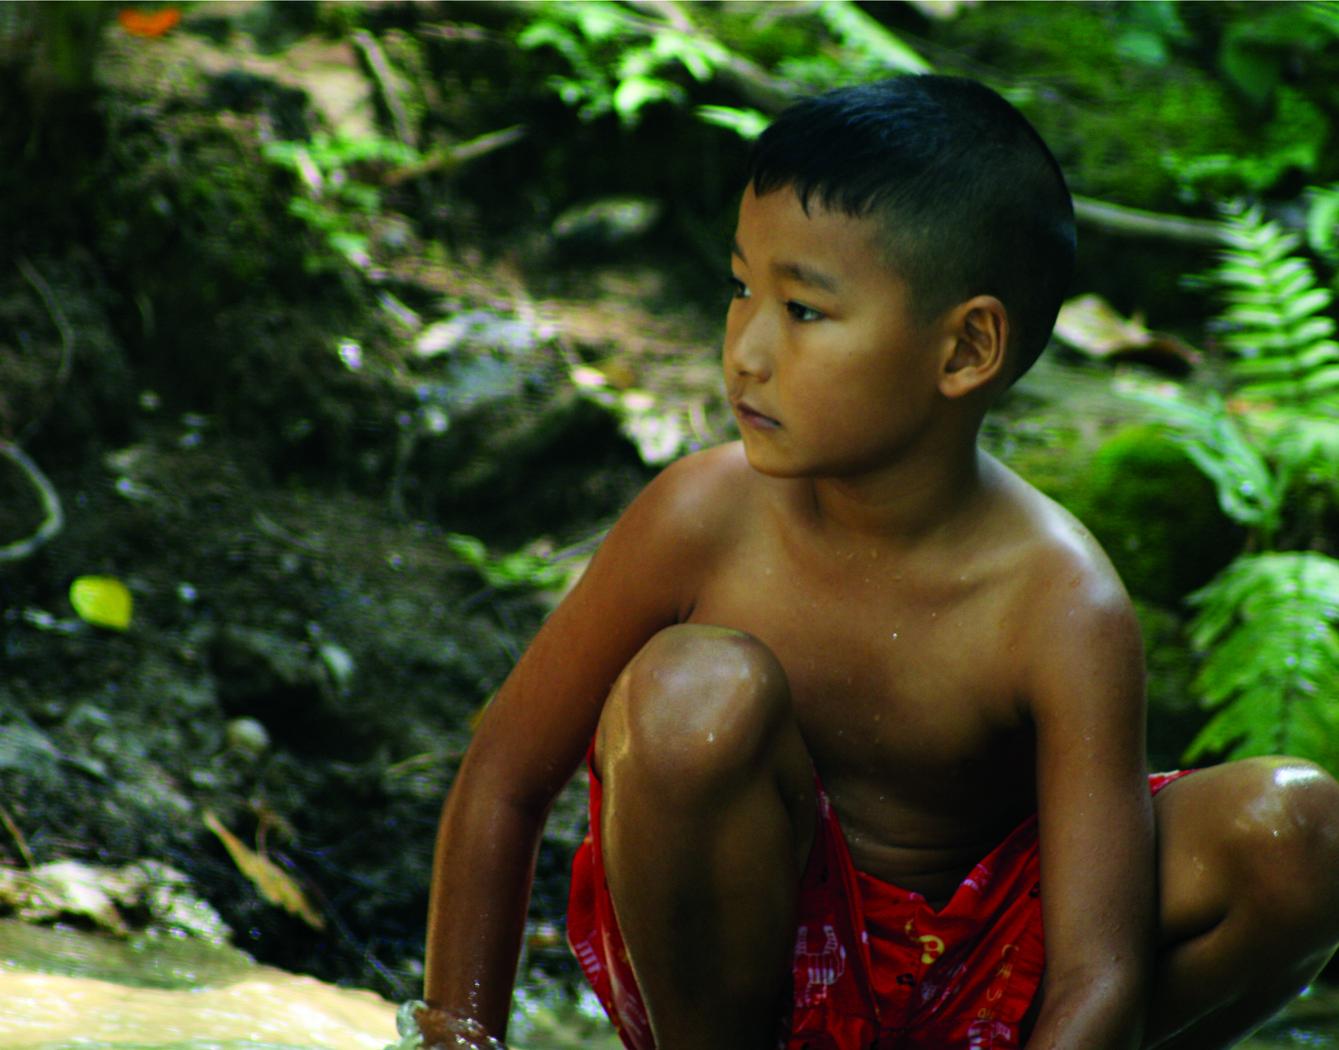 Thai boy at the waterfall